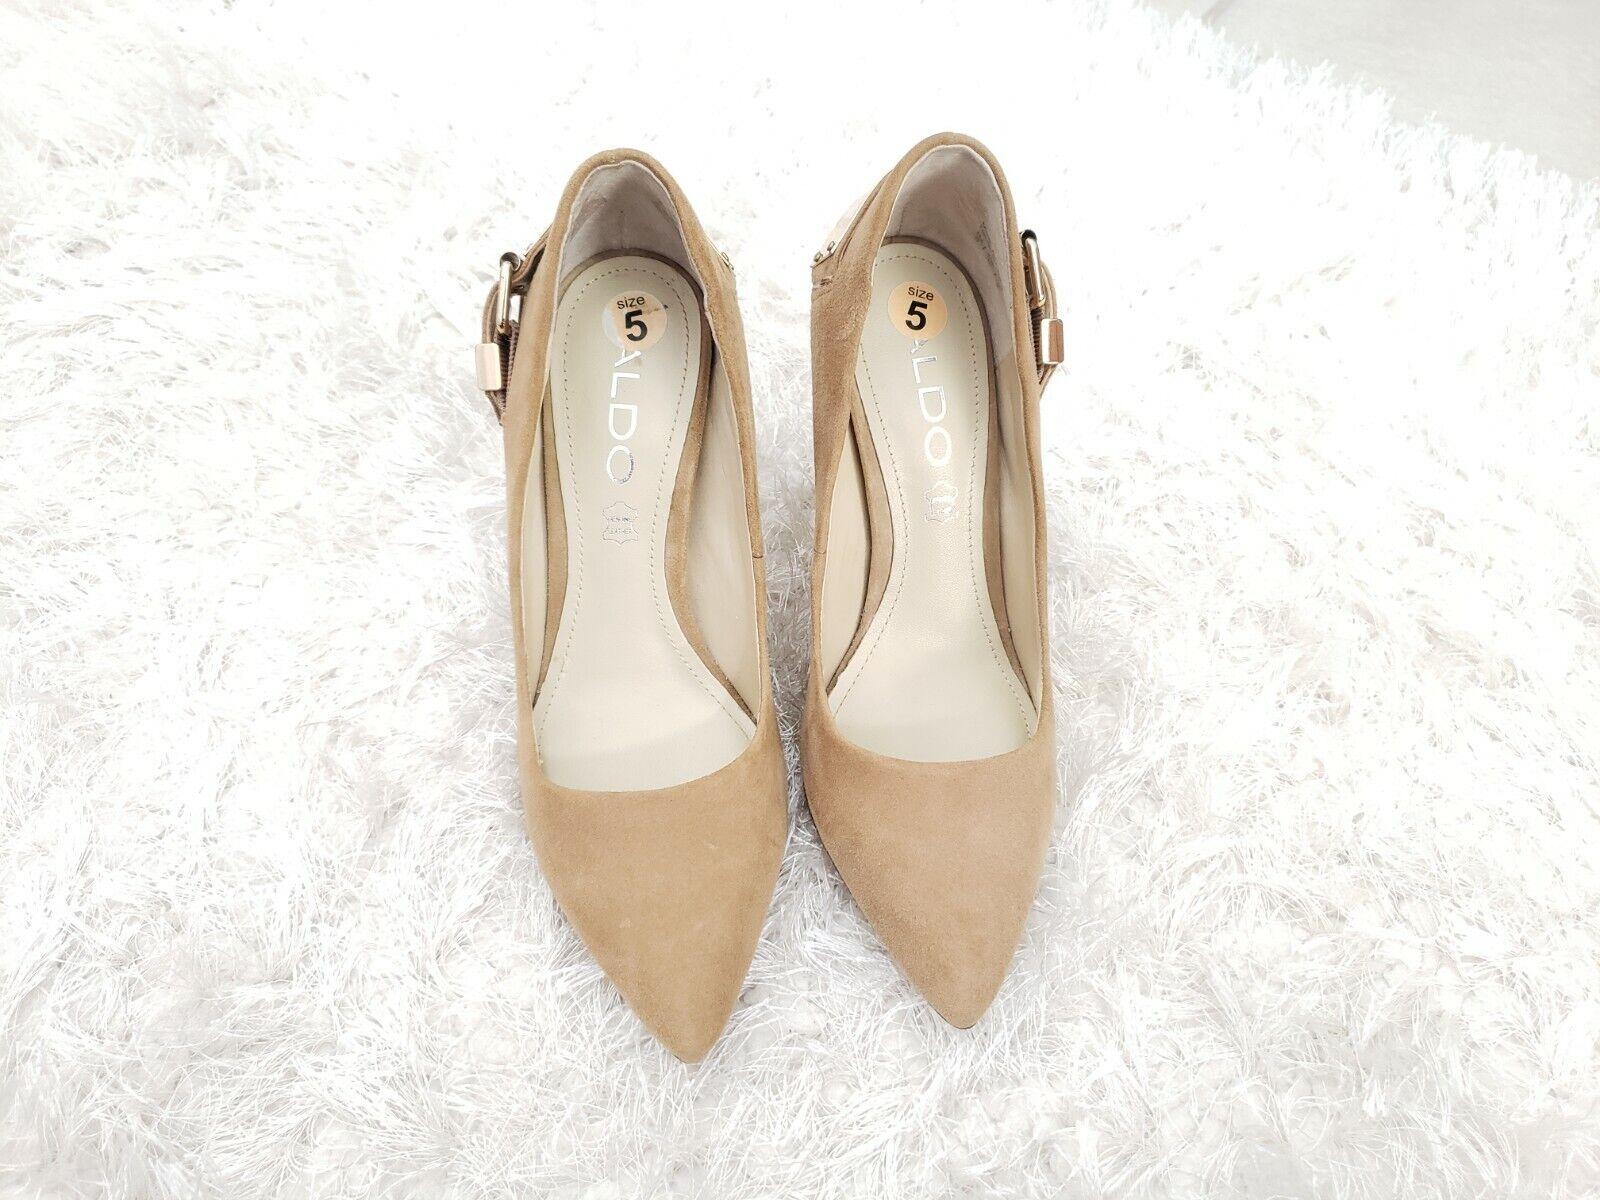 🌺ALDO Beige/Nude Suede Pointy Toe SlipOn Classic High Heels Gold Buckle Pumps 5